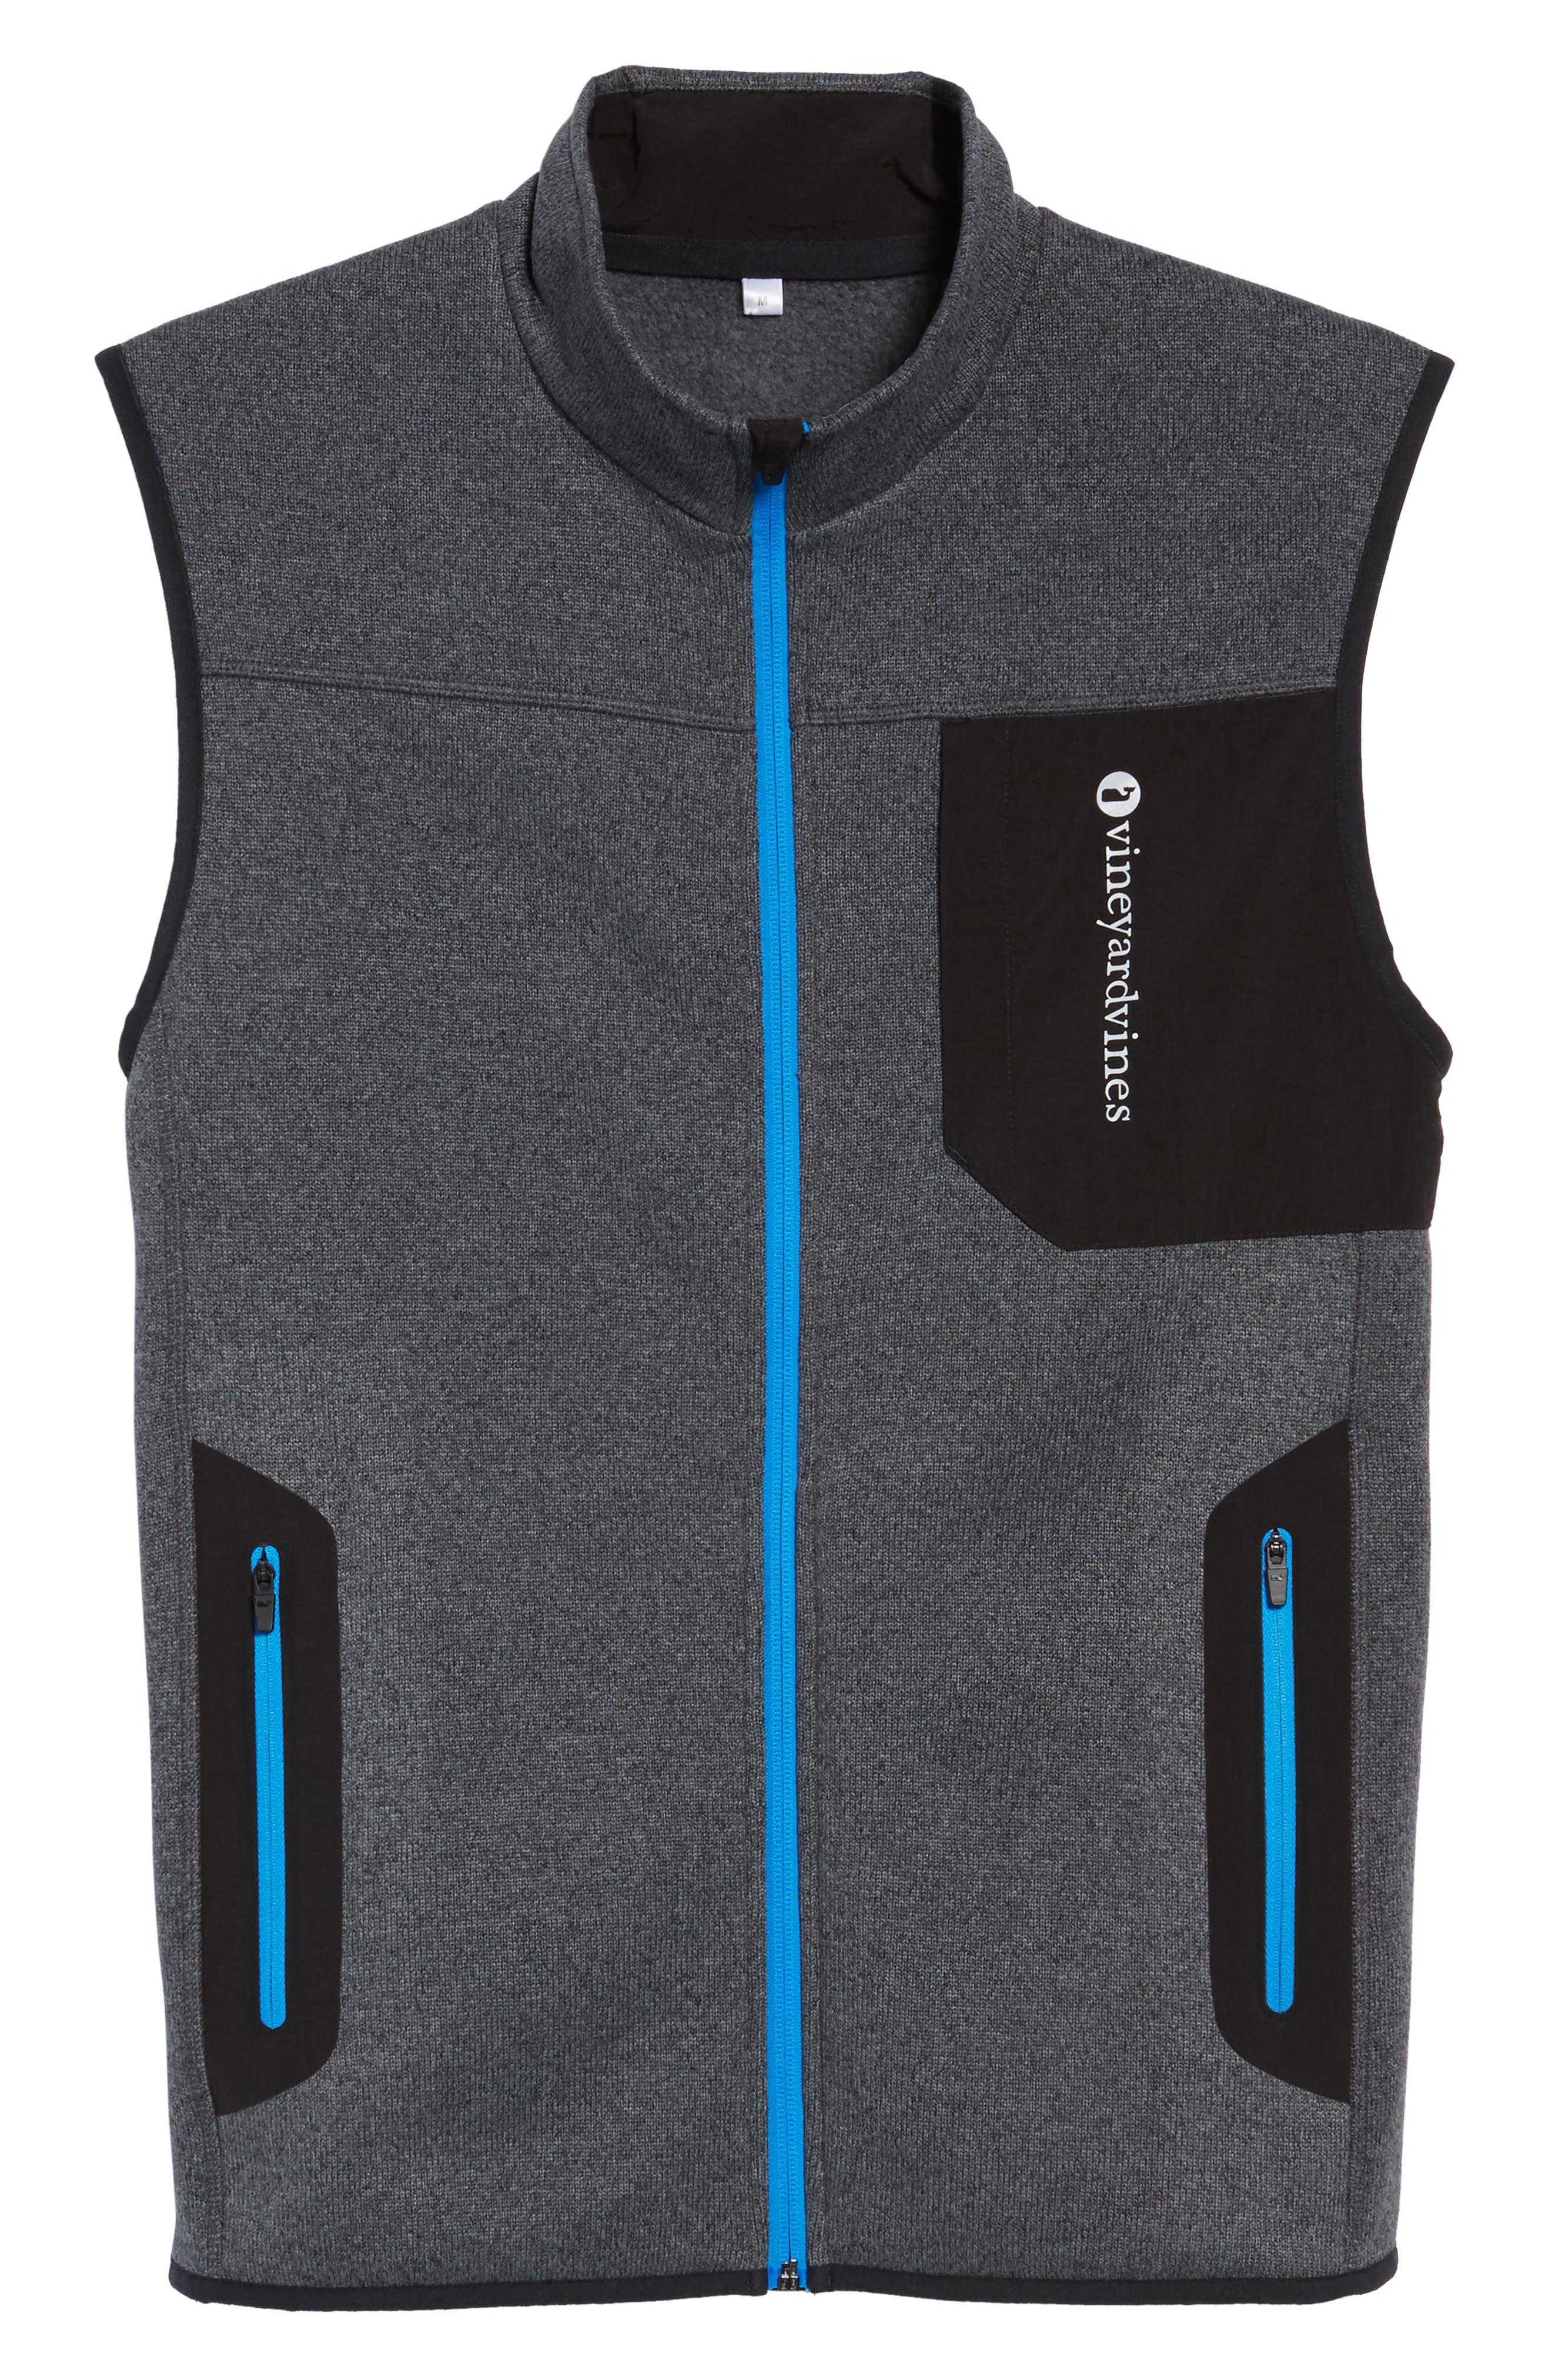 Tech Sweater Fleece Vest,                             Alternate thumbnail 5, color,                             020